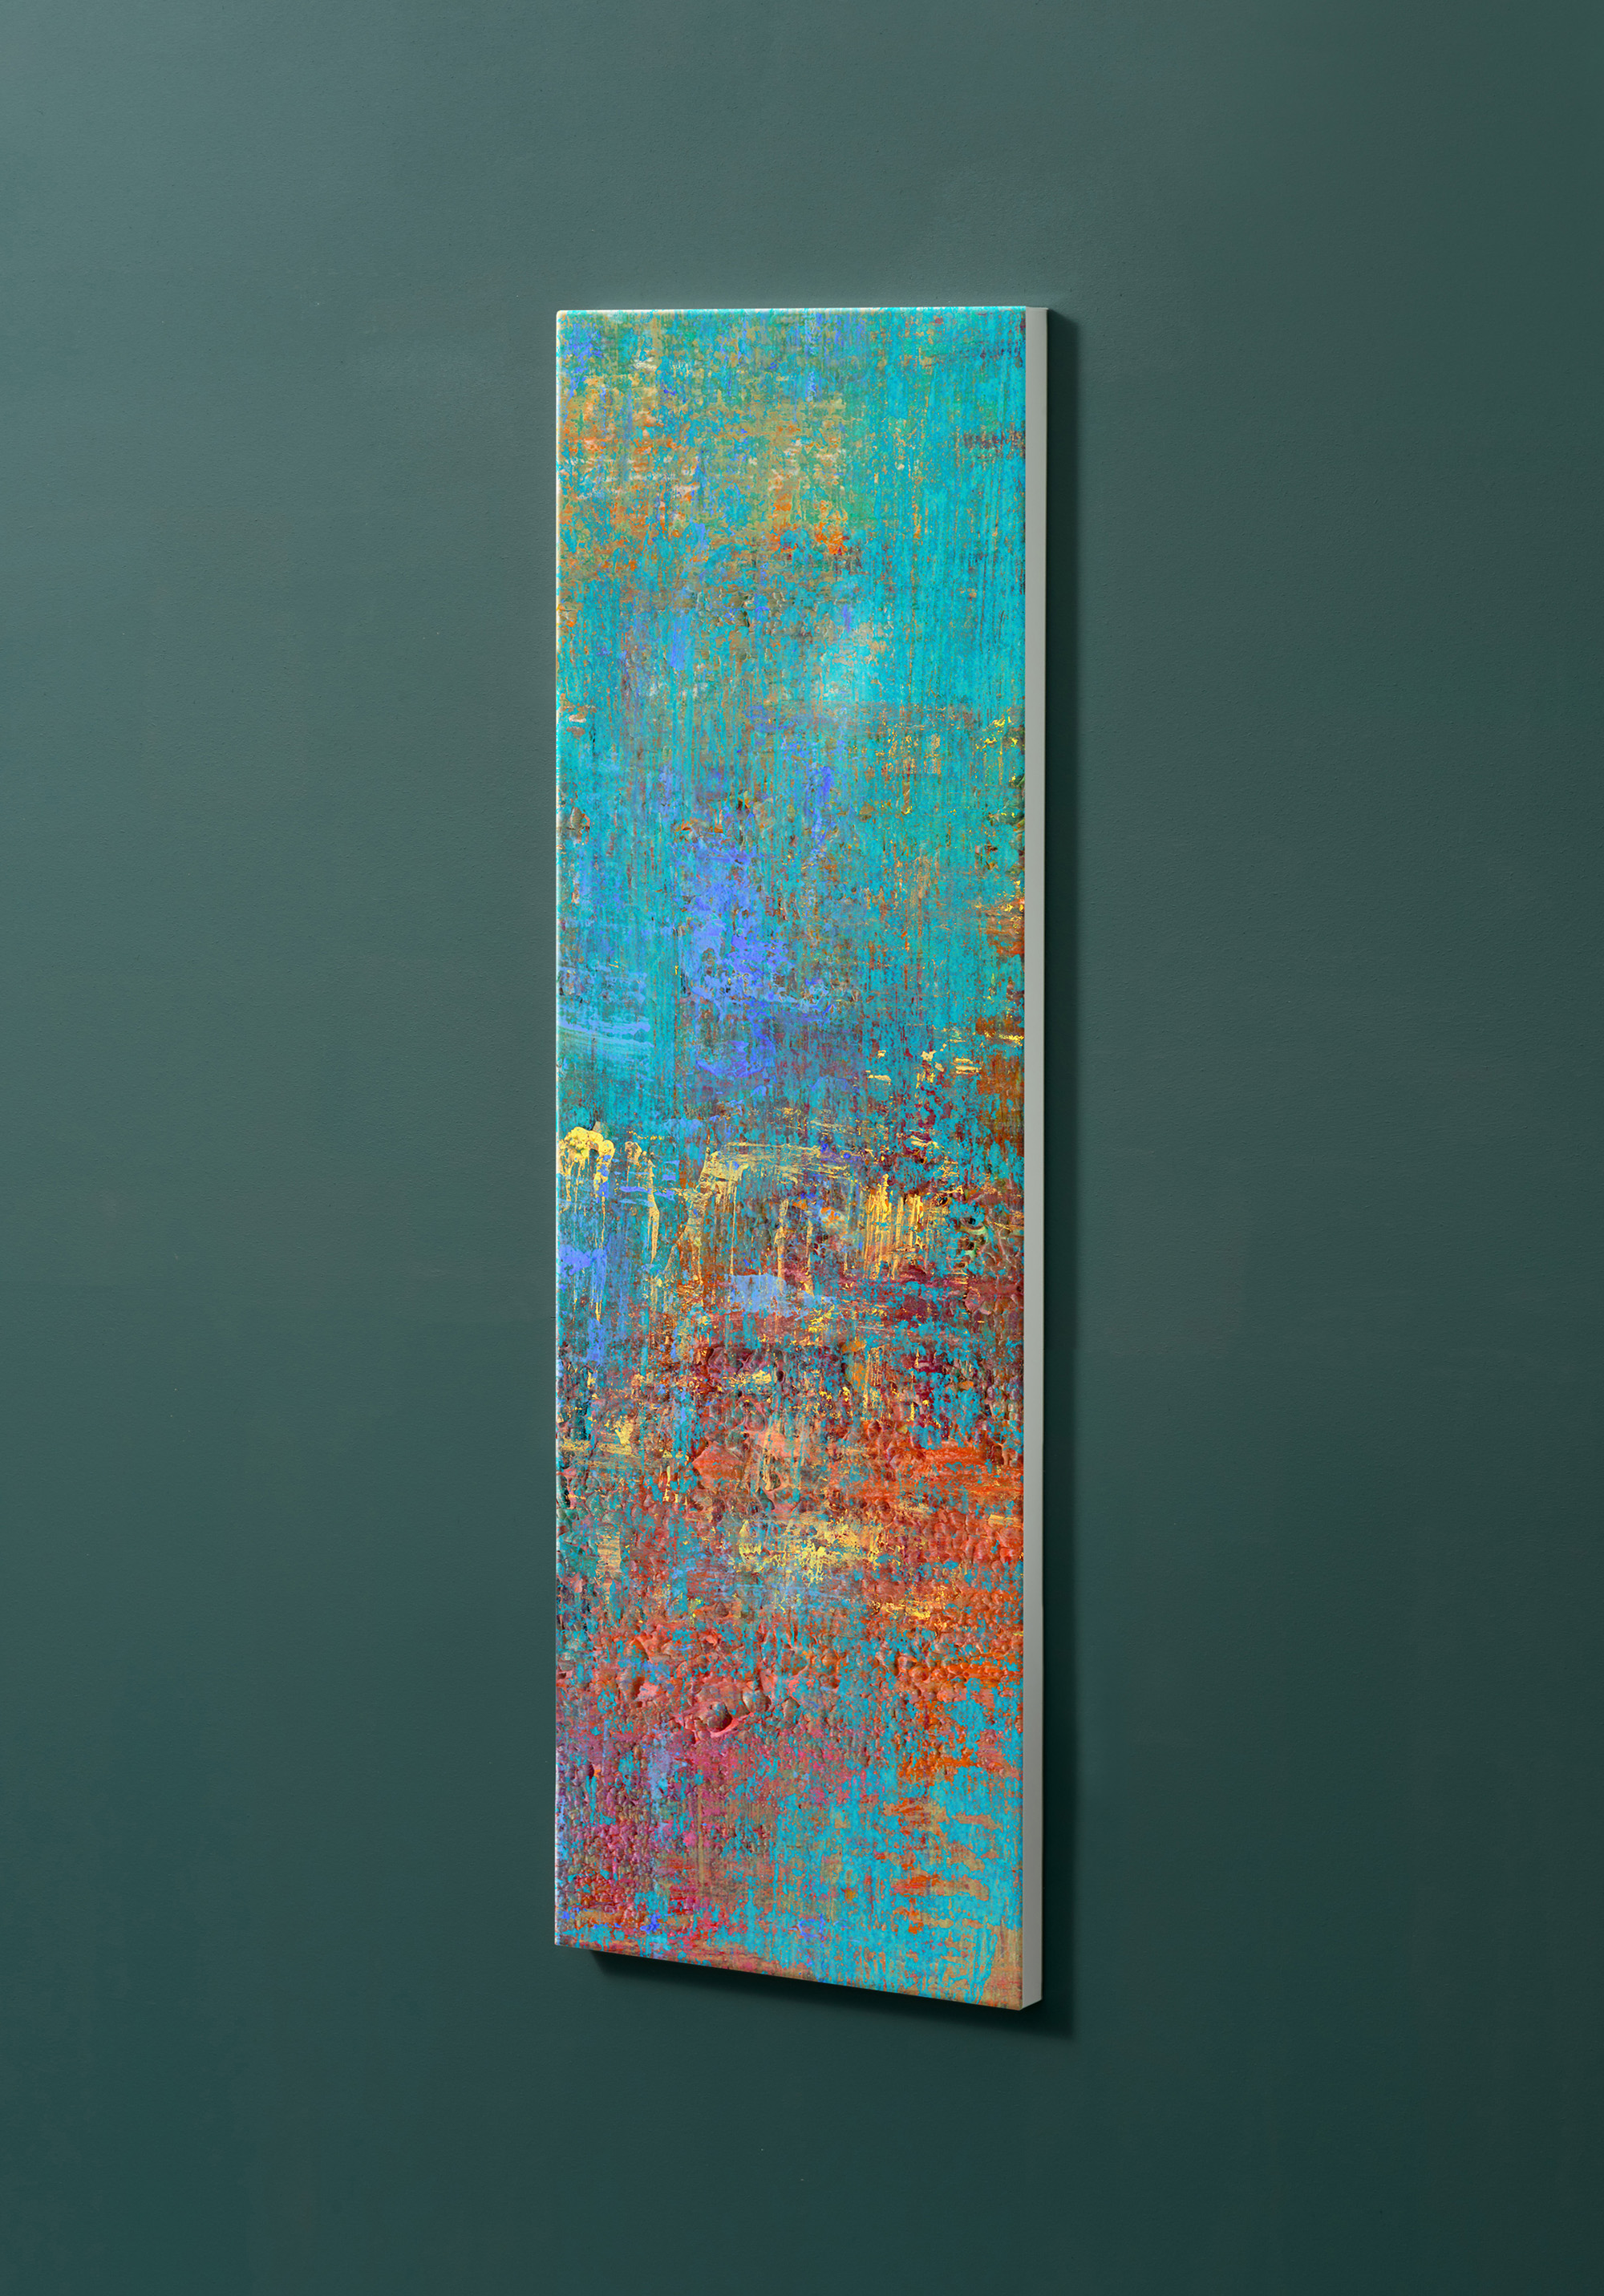 Magnettafel NOTIZ 30x90cm Motiv-Pinnwand M110 Abstrakt Kunst